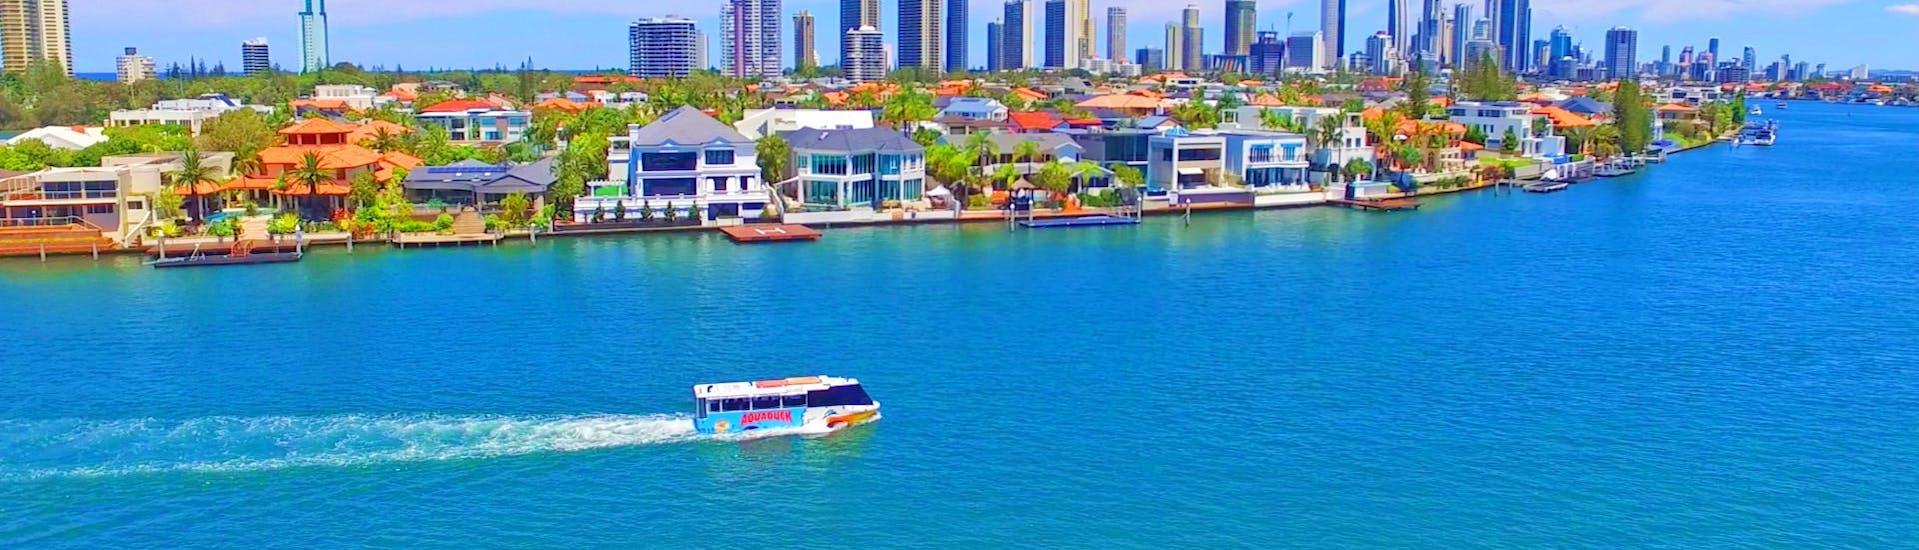 aquaduck-gold-coast-cruise-aquaduck-boat-tours